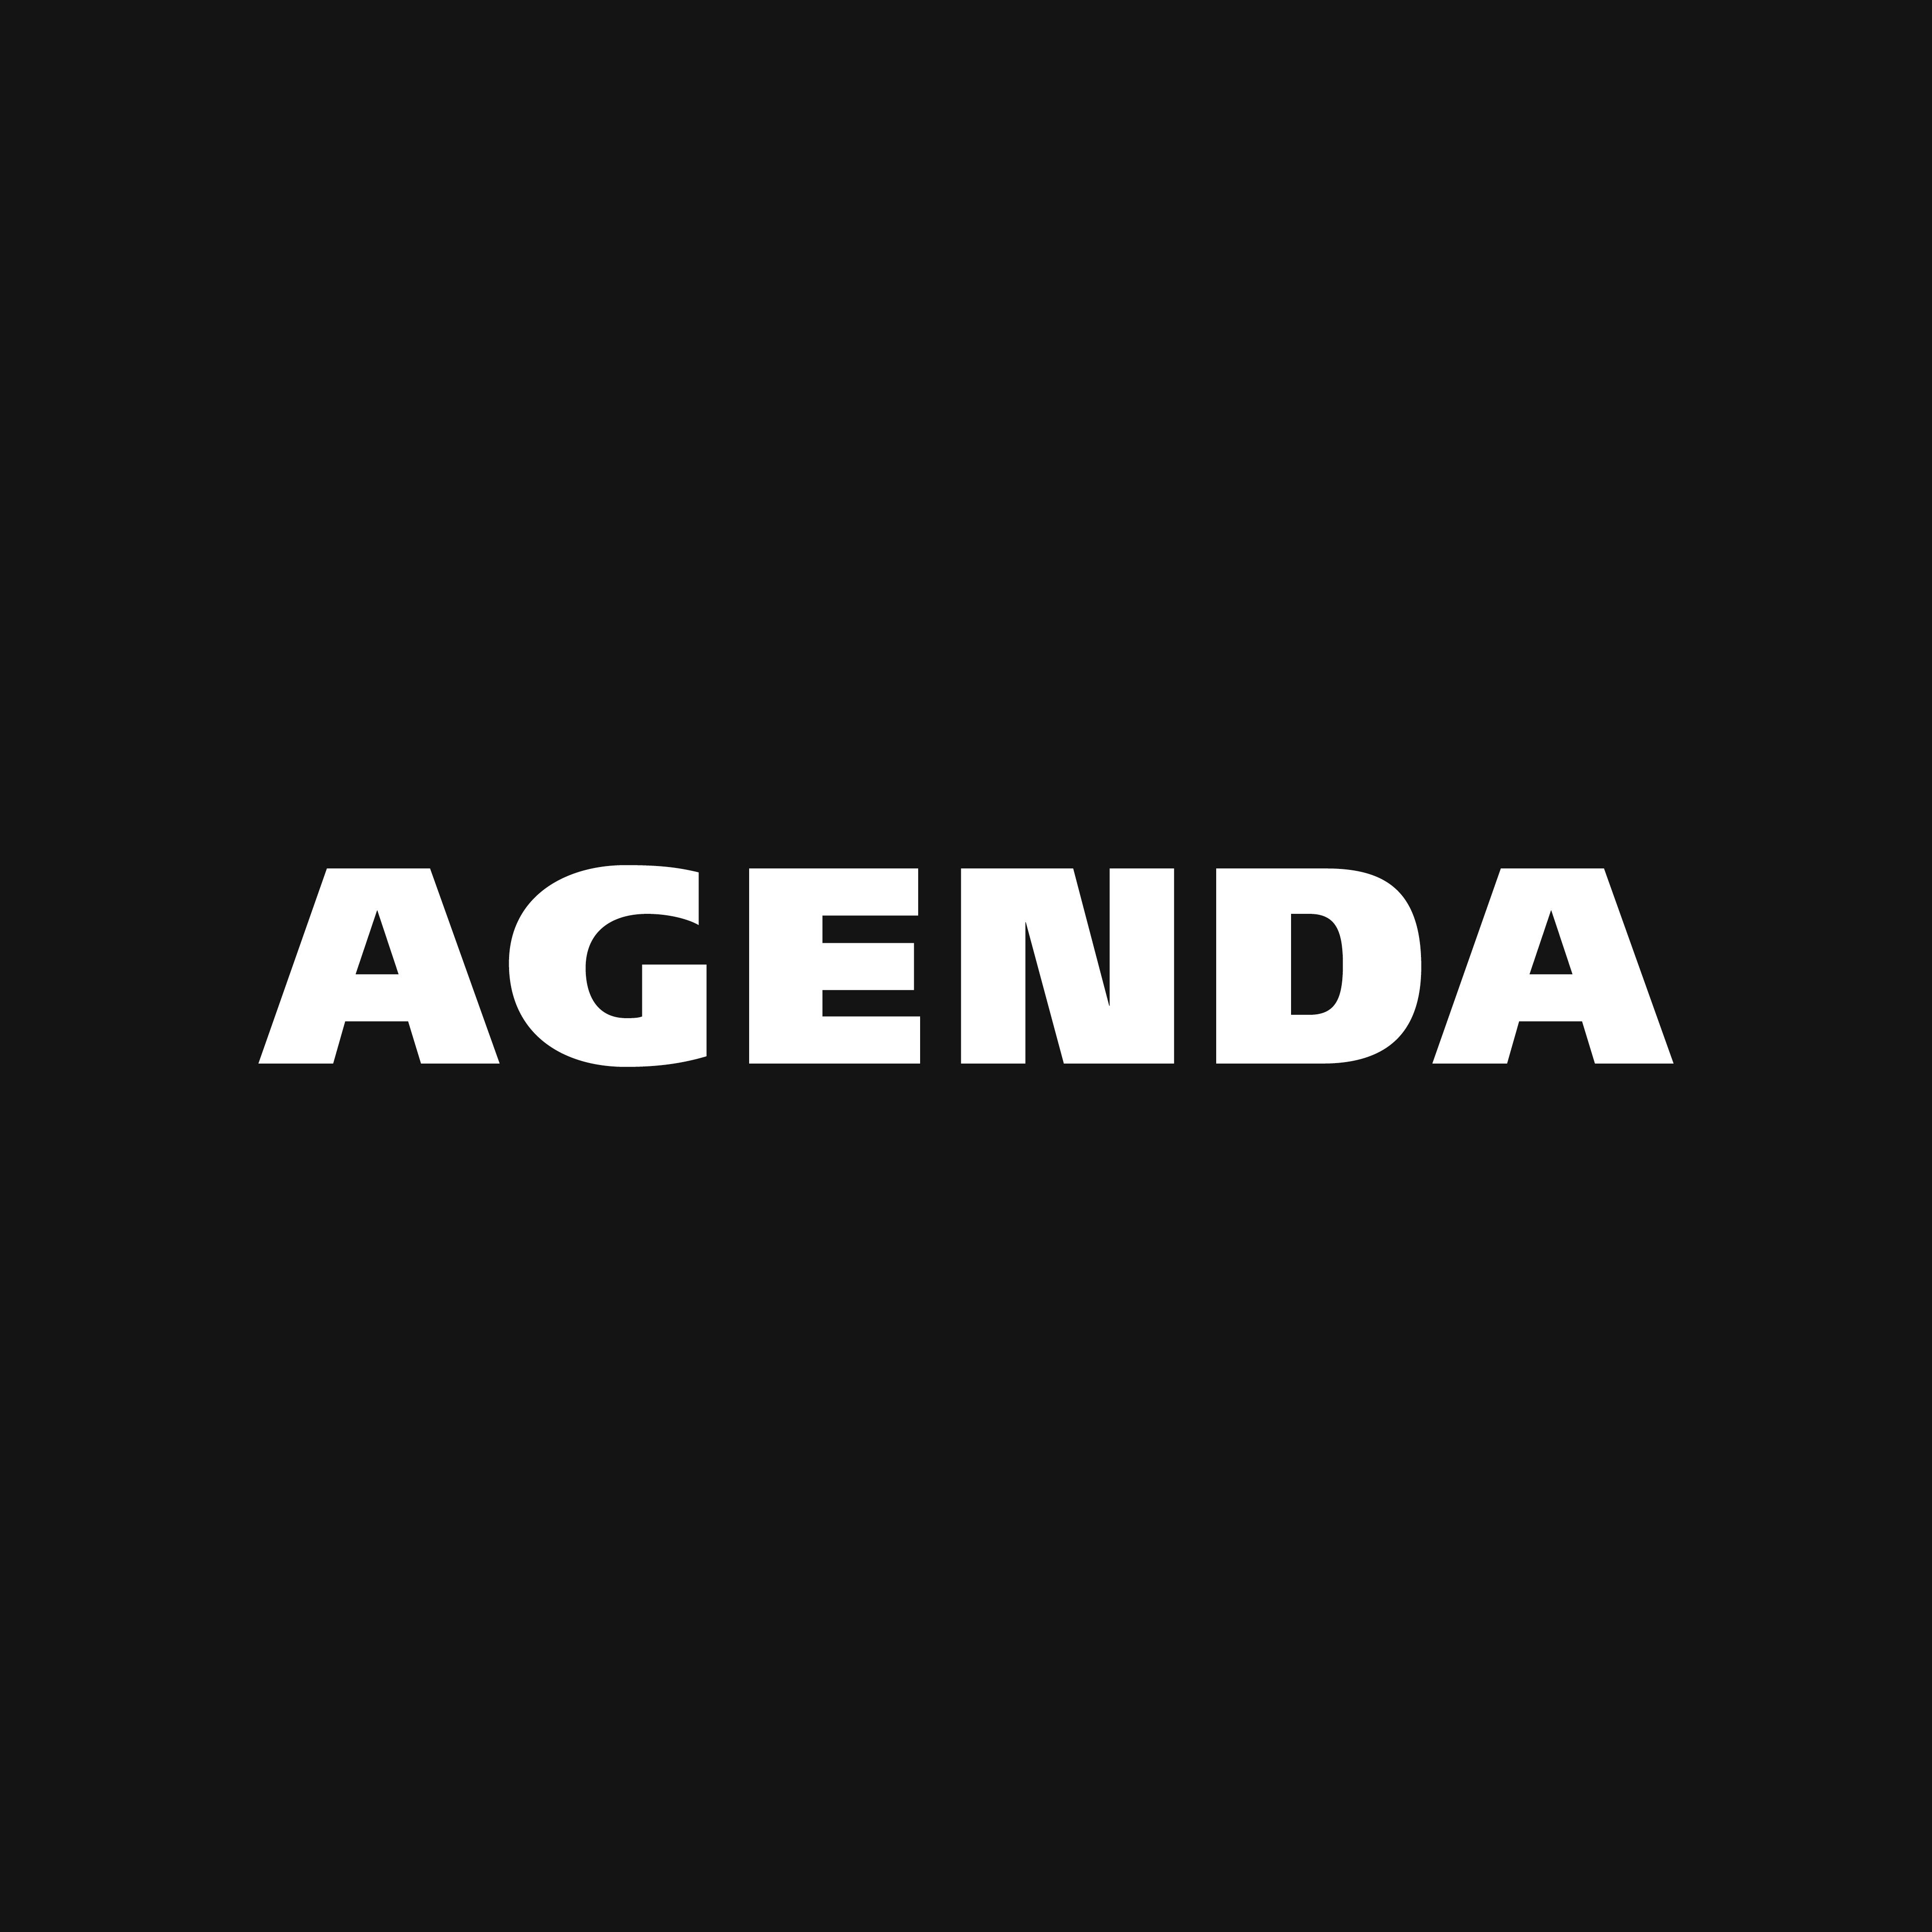 893e6f8d0dc4e Agenda podcast